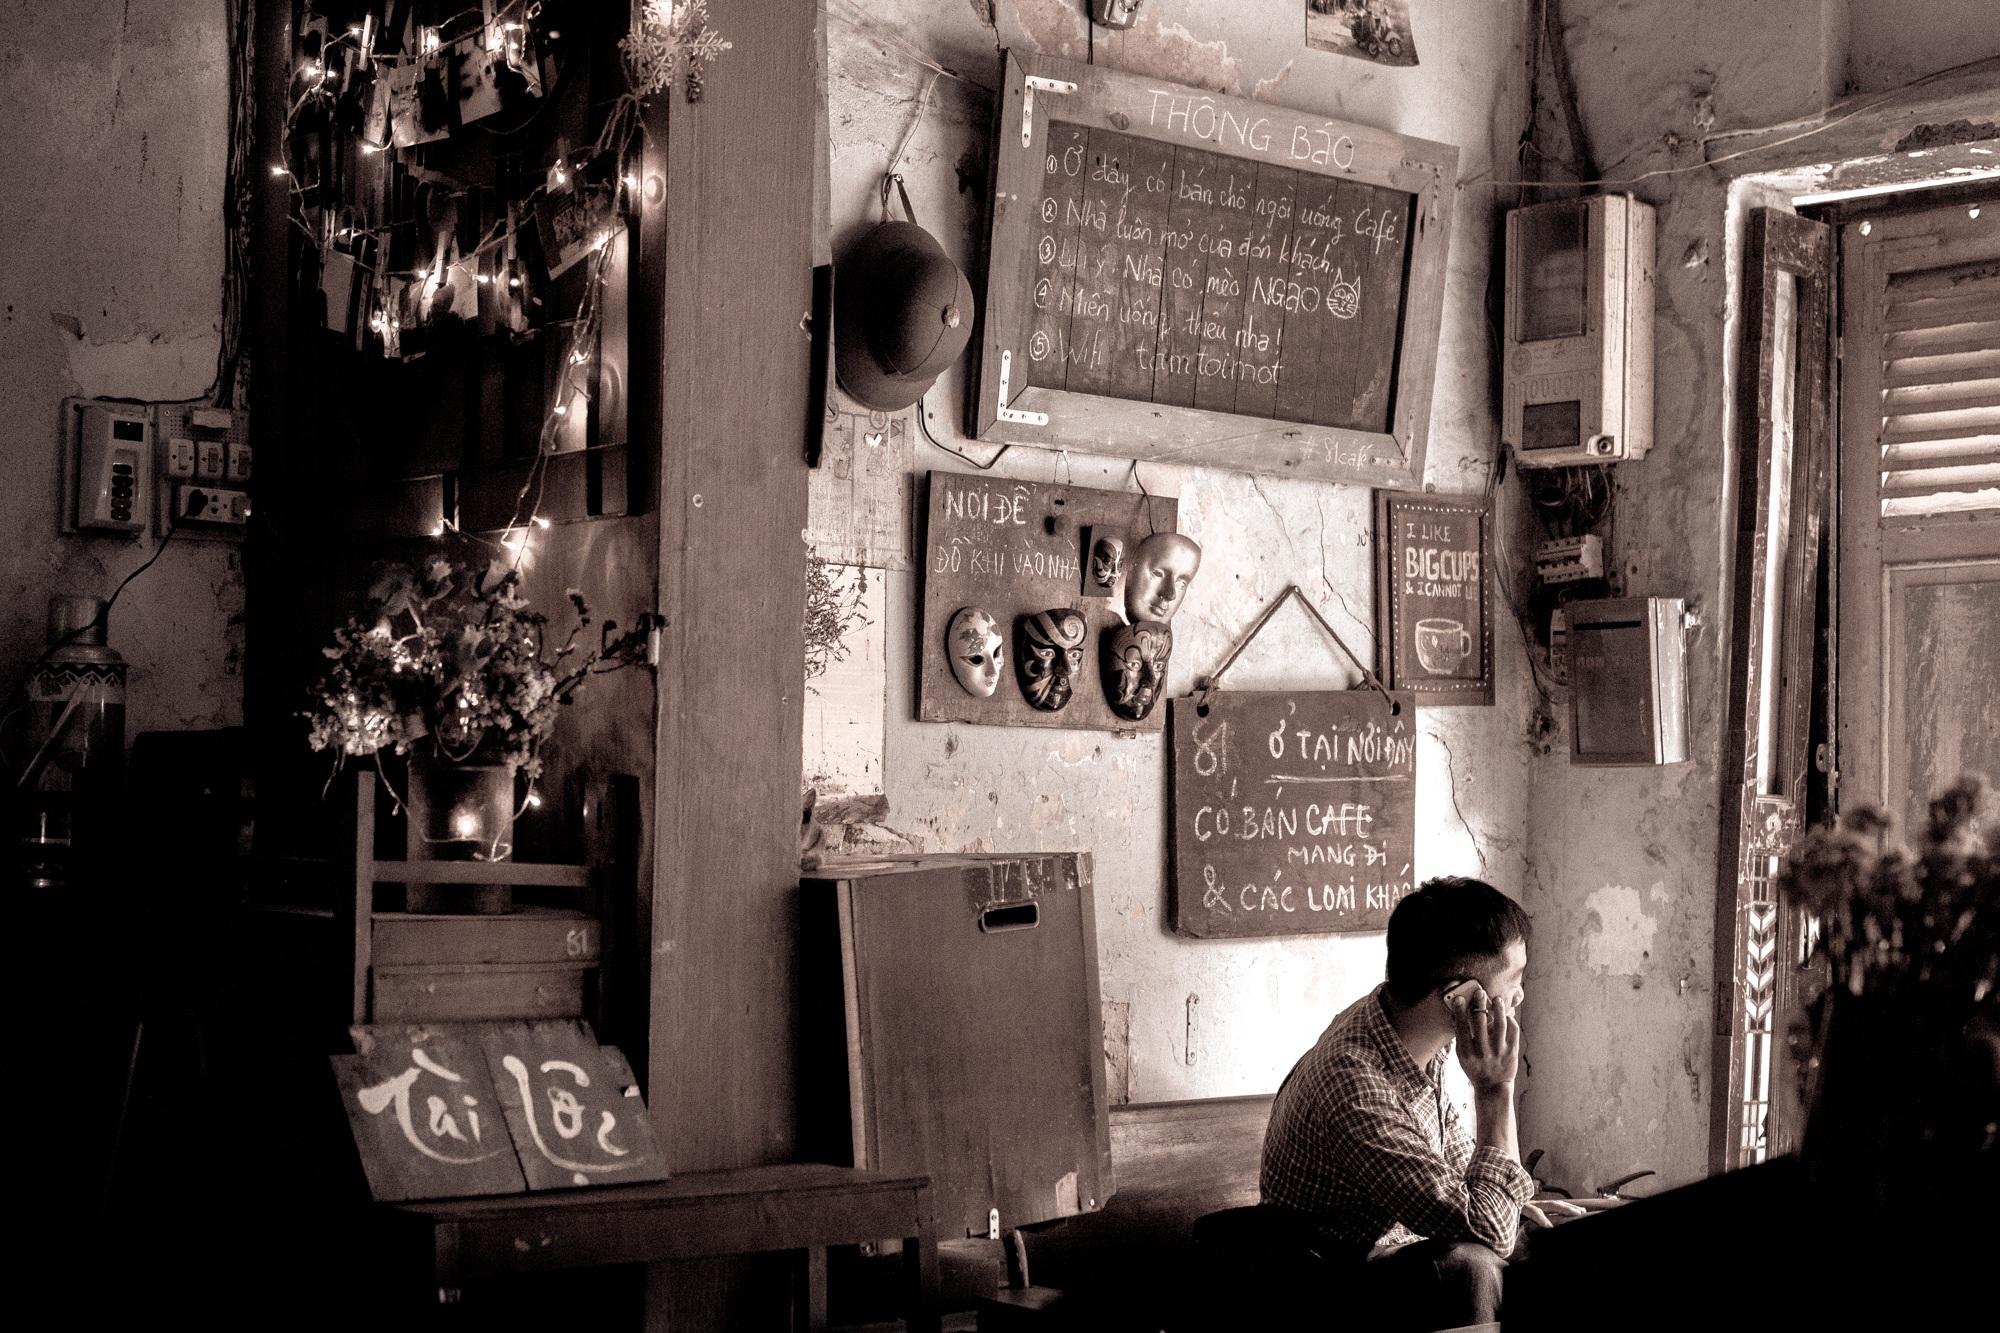 Gambar Kedai Kopi Hitam Putih Gambar Manusia Kafe Kedai Kopi Hitam Dan Putih Jalan